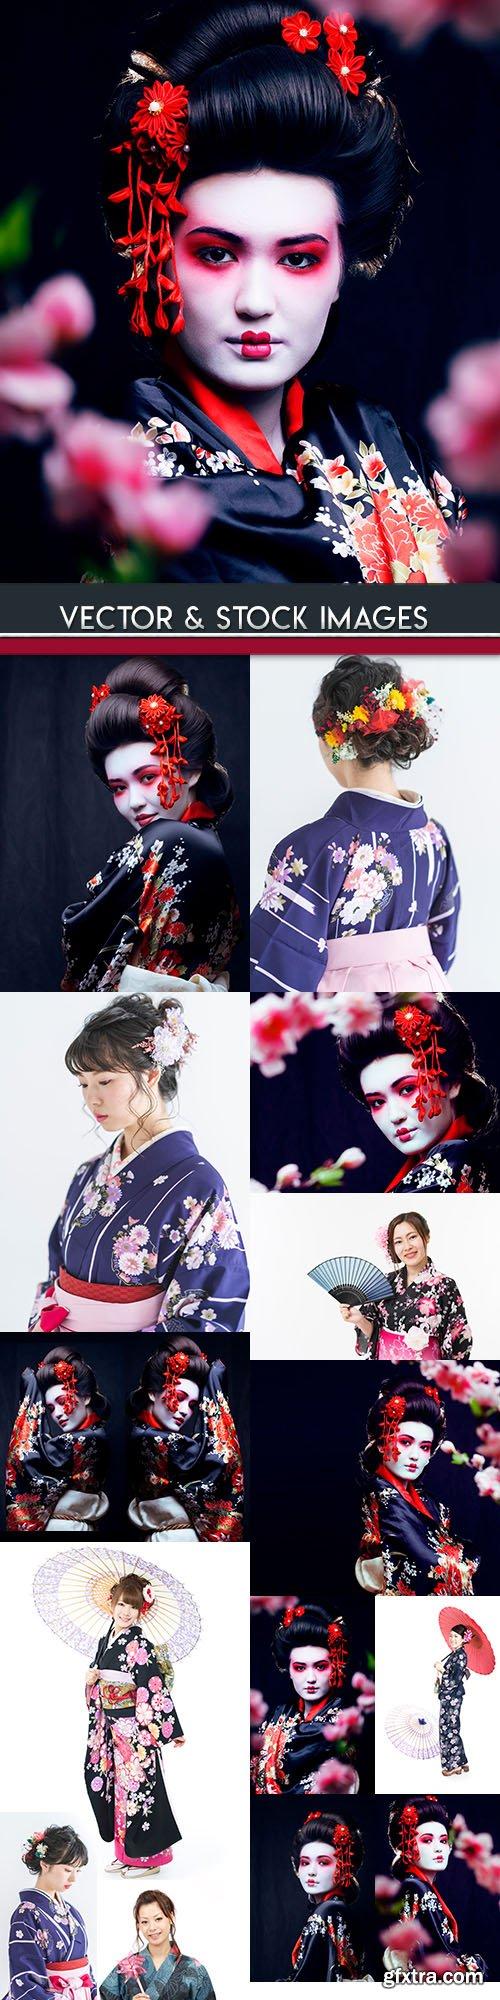 Geisha east beautiful in kimono and flowers in hair